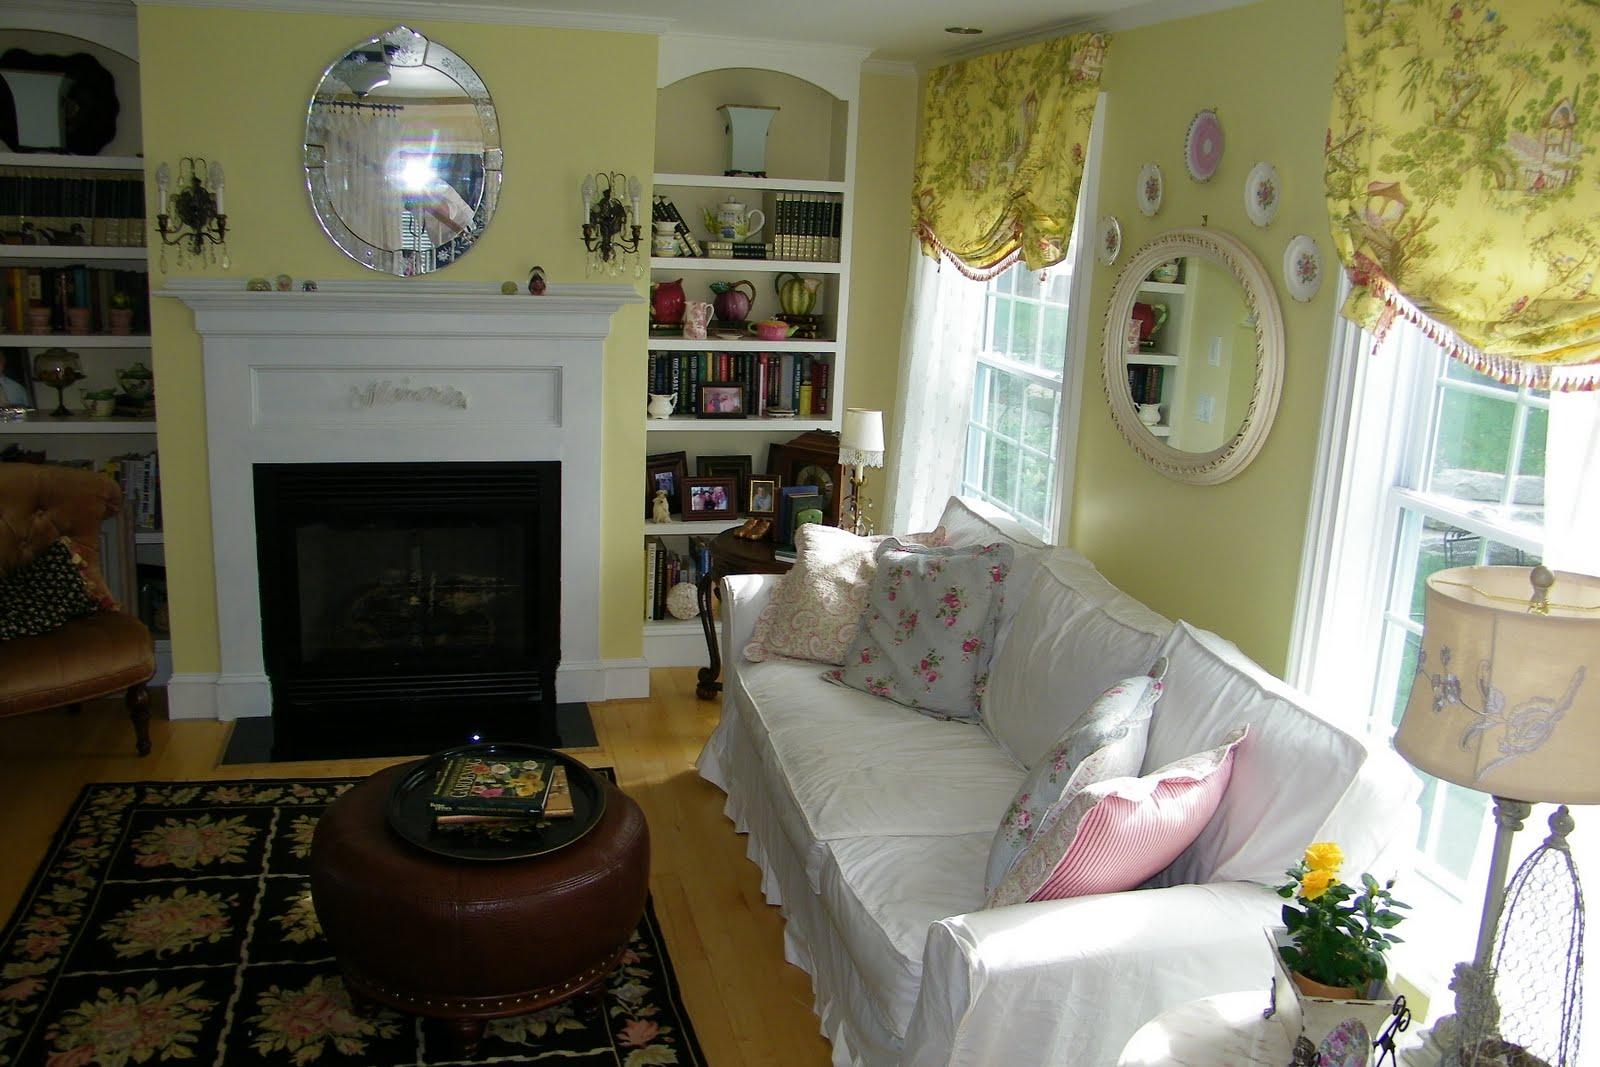 Stunning 12 Images Home Redecoration - Lentine Marine | 12794